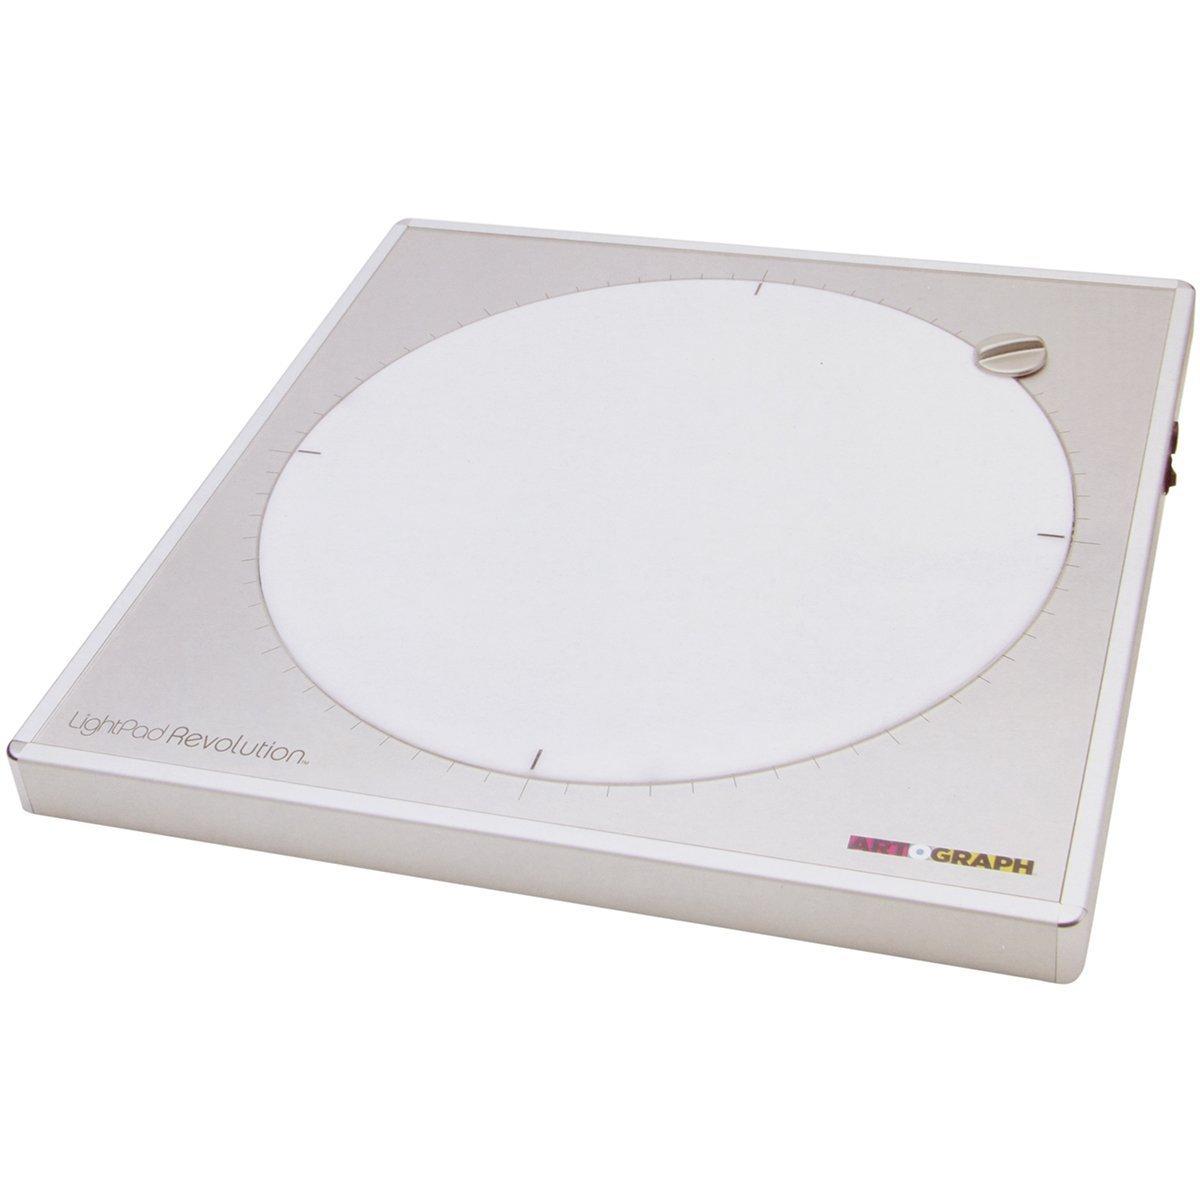 Artograph LightPad Revolution 80 LED Light Box by Artograph